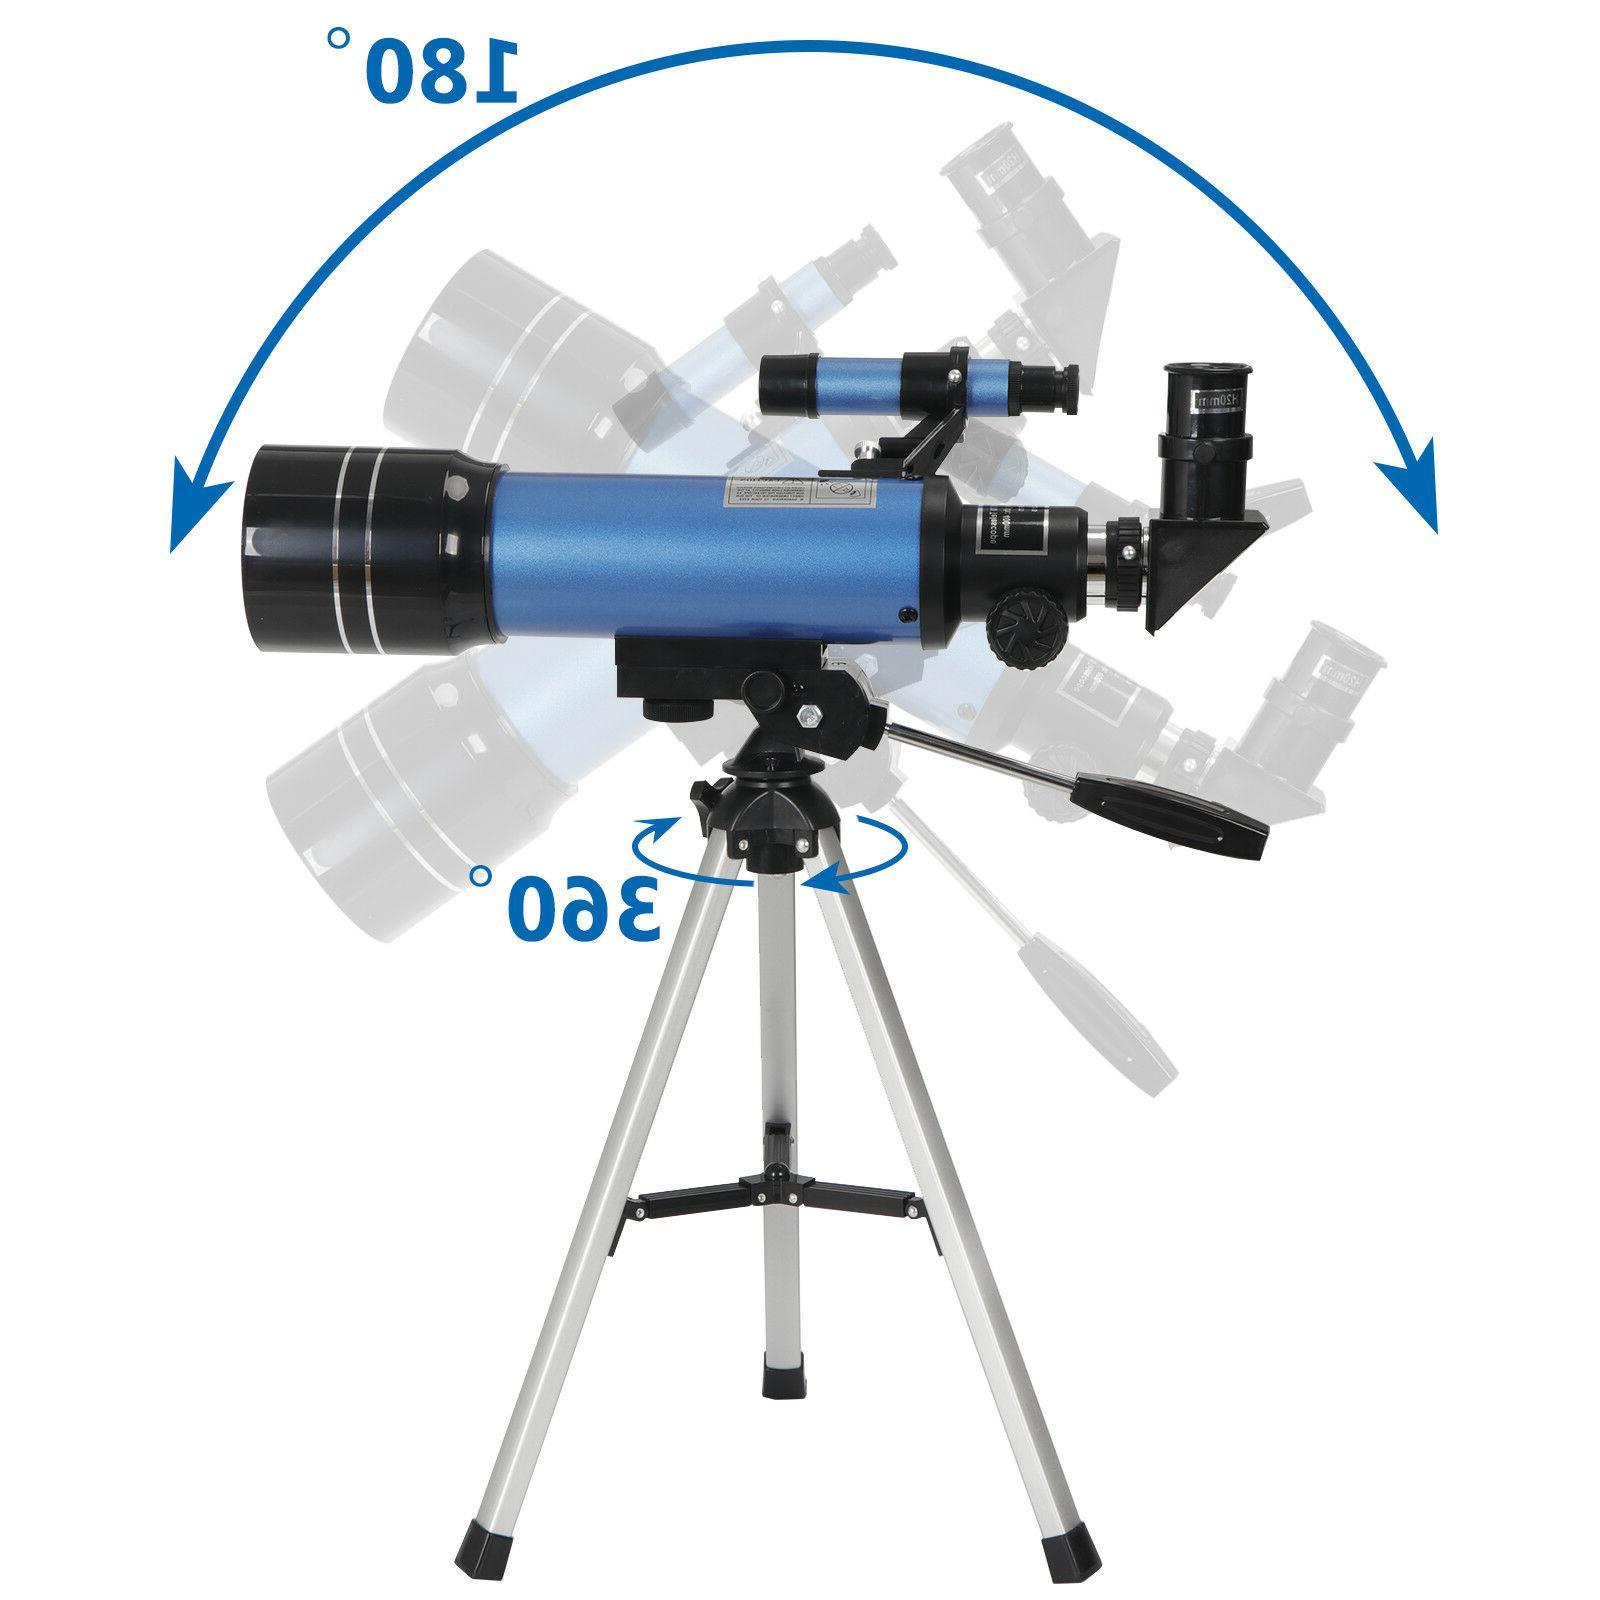 70mm Portable Telescope Travel Eyepieces Tripod